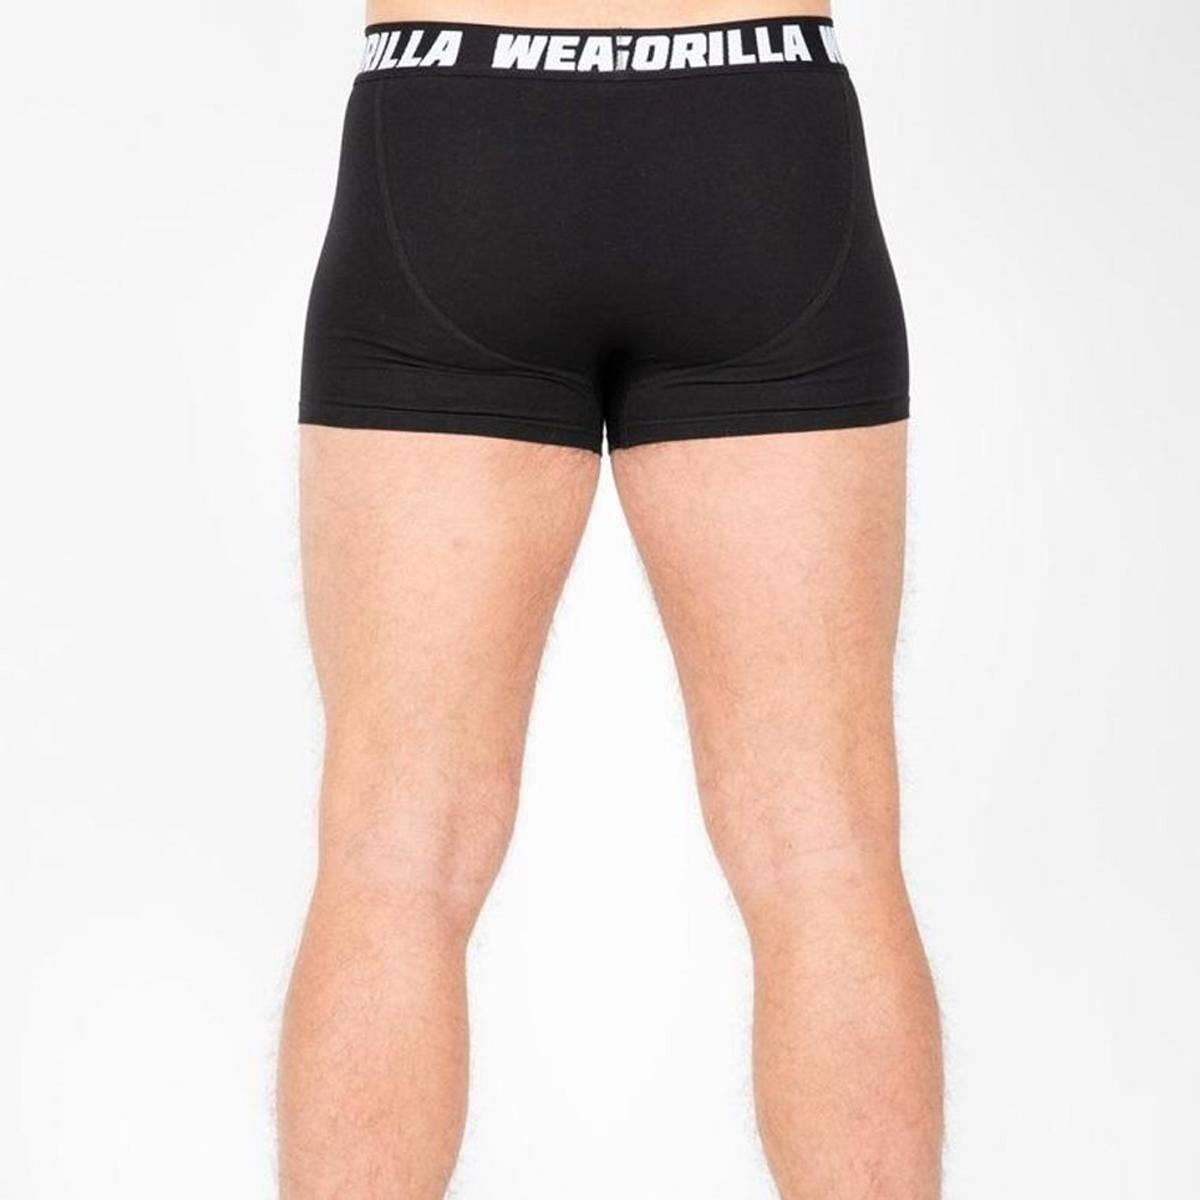 Gorilla Wear Boxershorts 3-pack